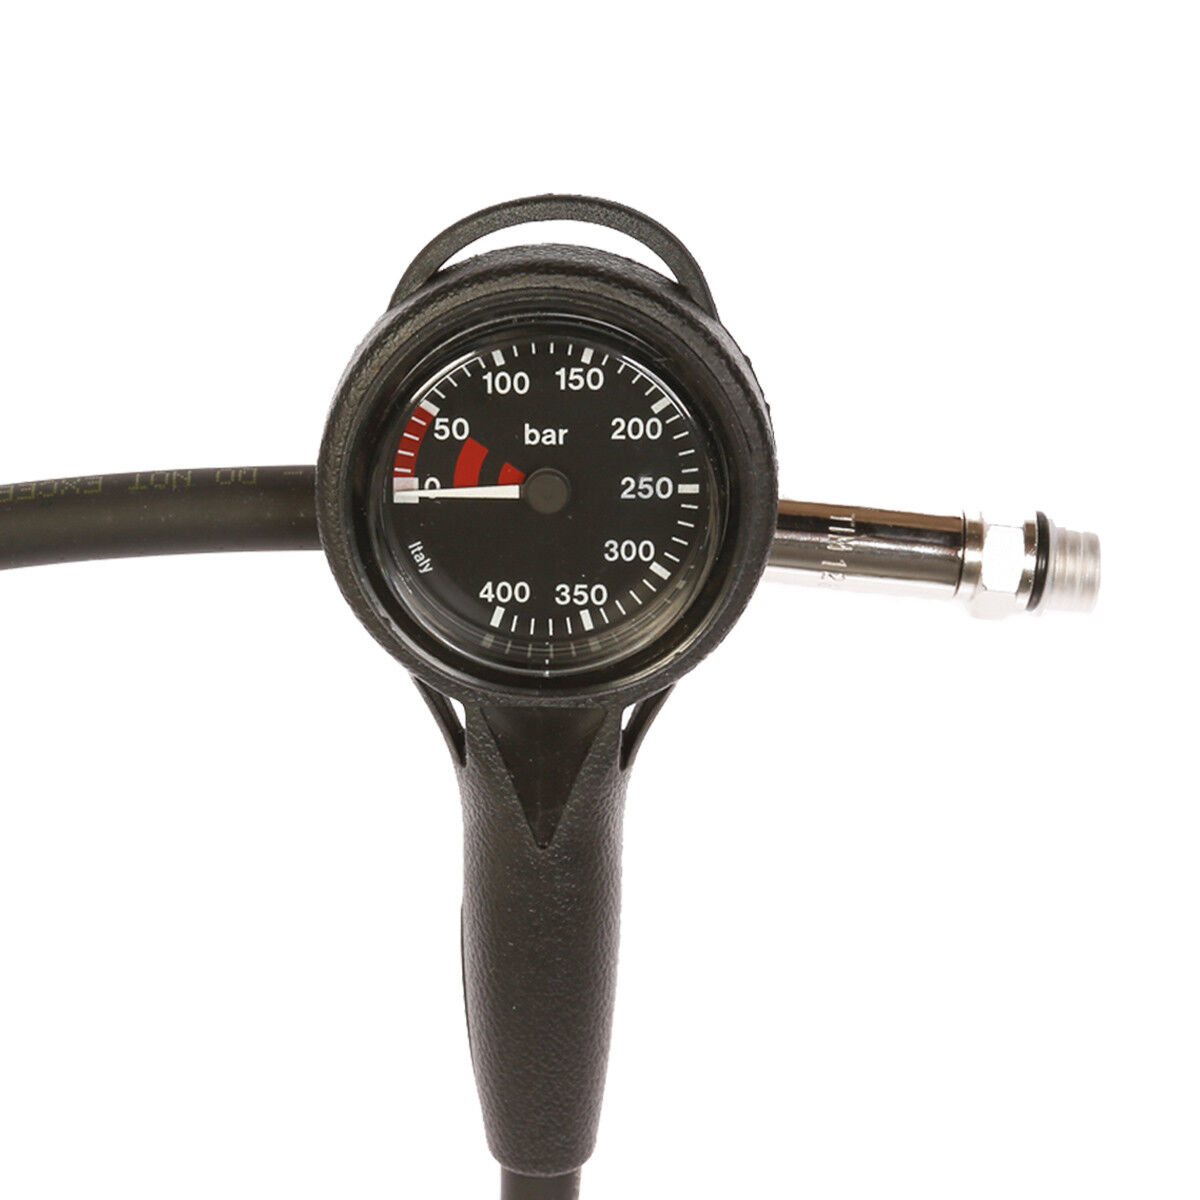 Slim Line Compact Manometer Manometer Manometer 400 Bar schwarz fd1798